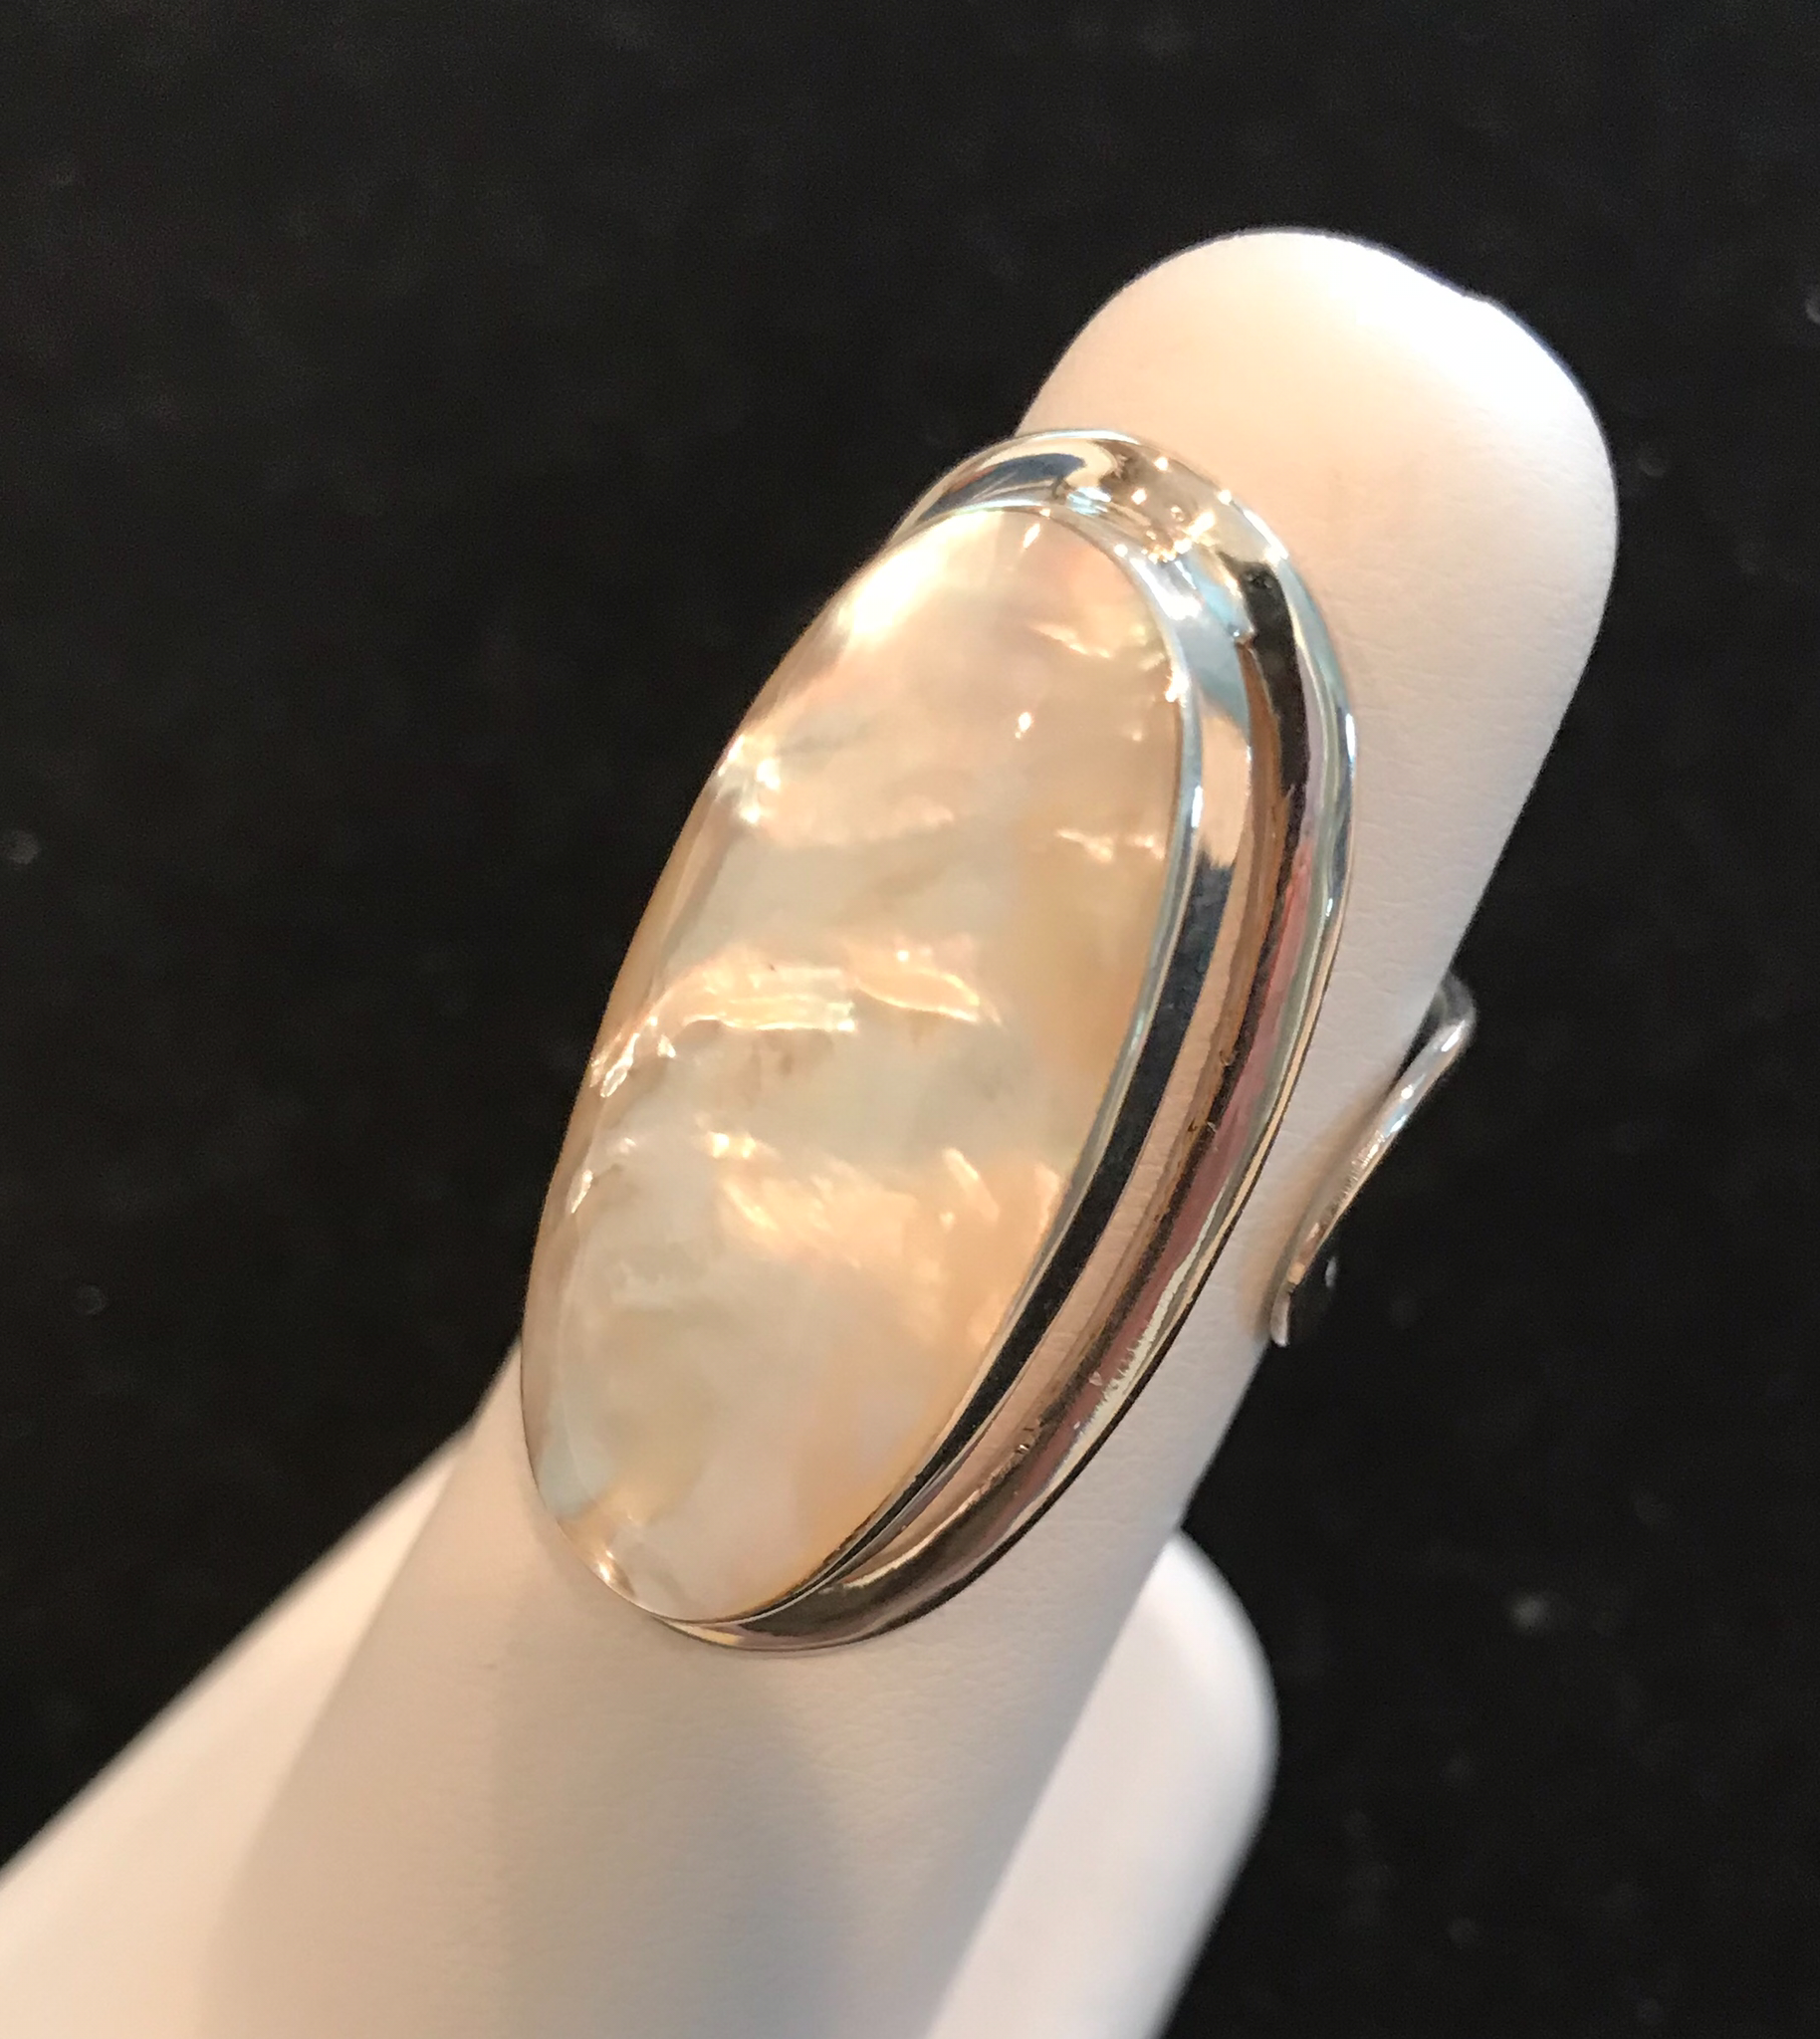 Large Oval Sterling Silver Adjustable Ring